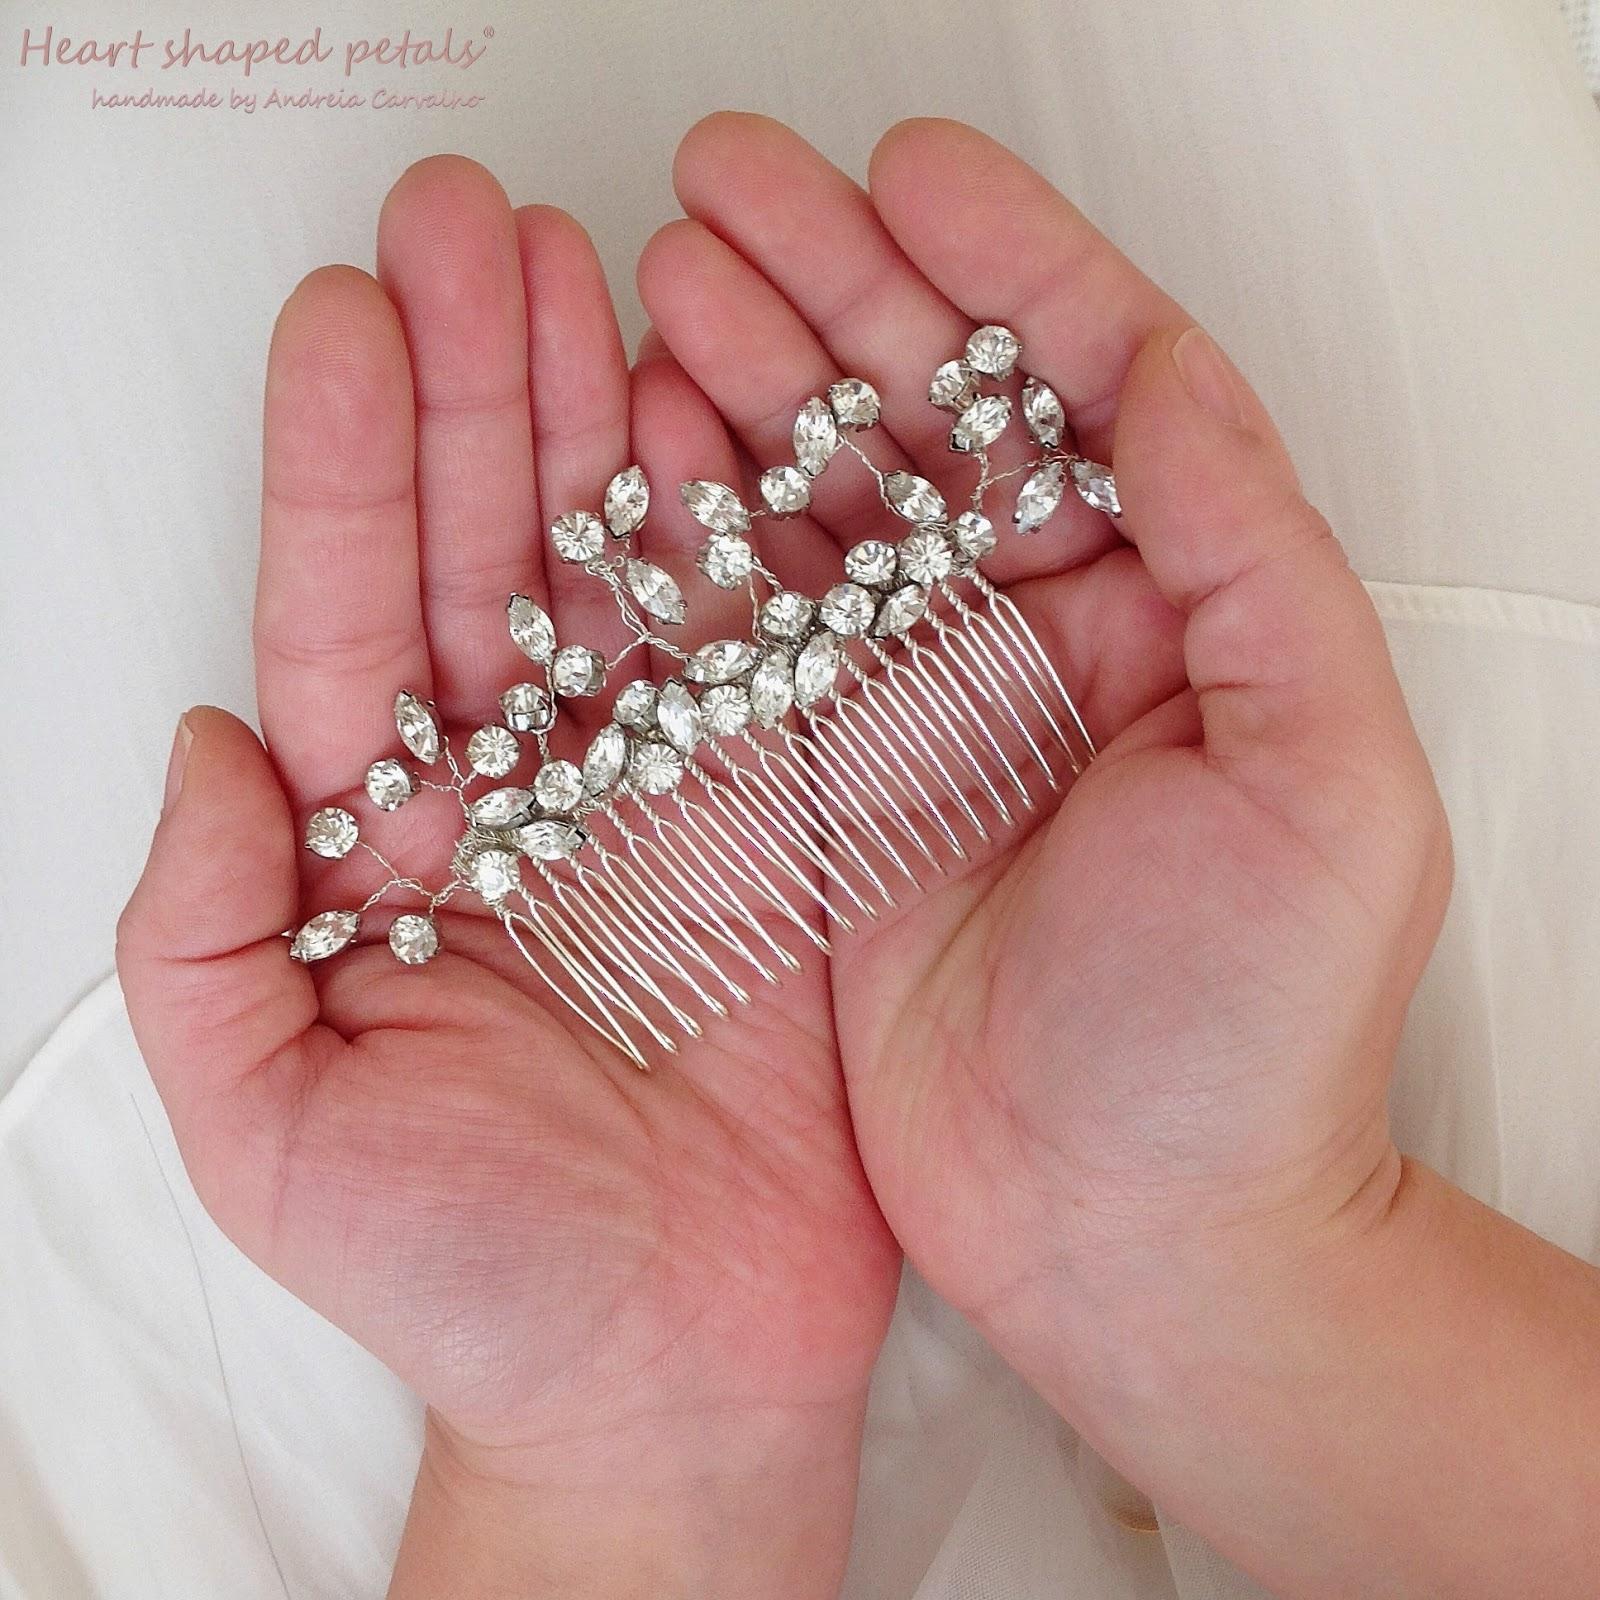 Bridal comb hair accessory